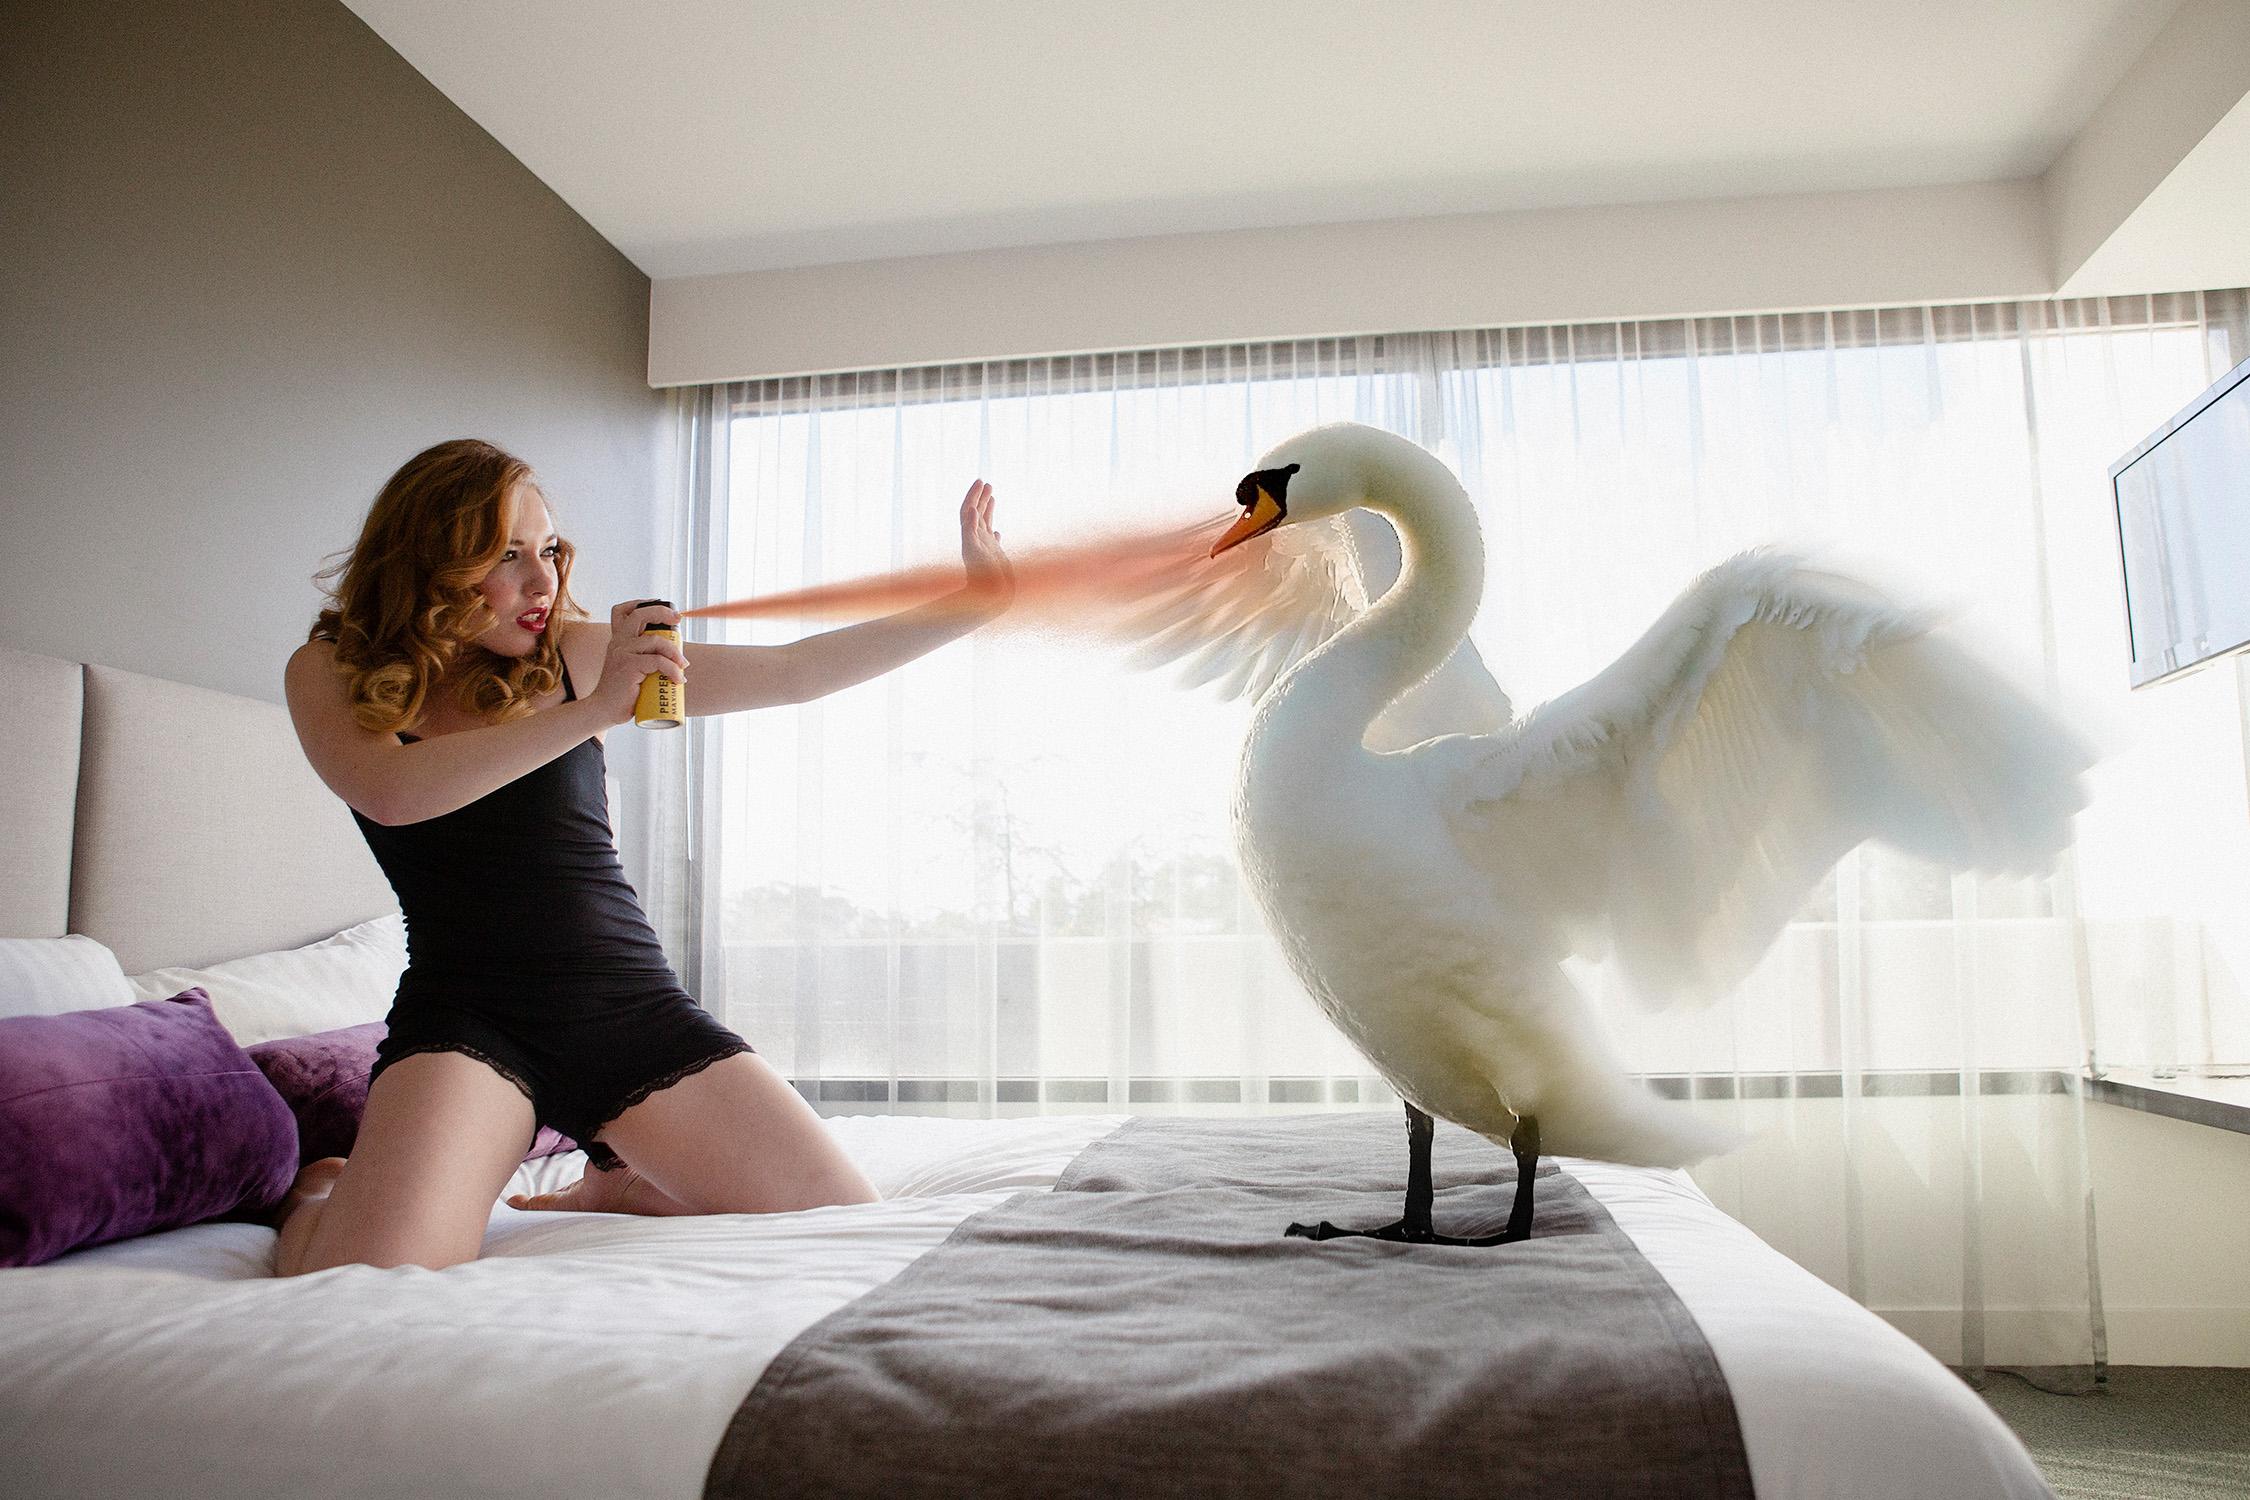 Alternate Endings #1: Leda & the Swan